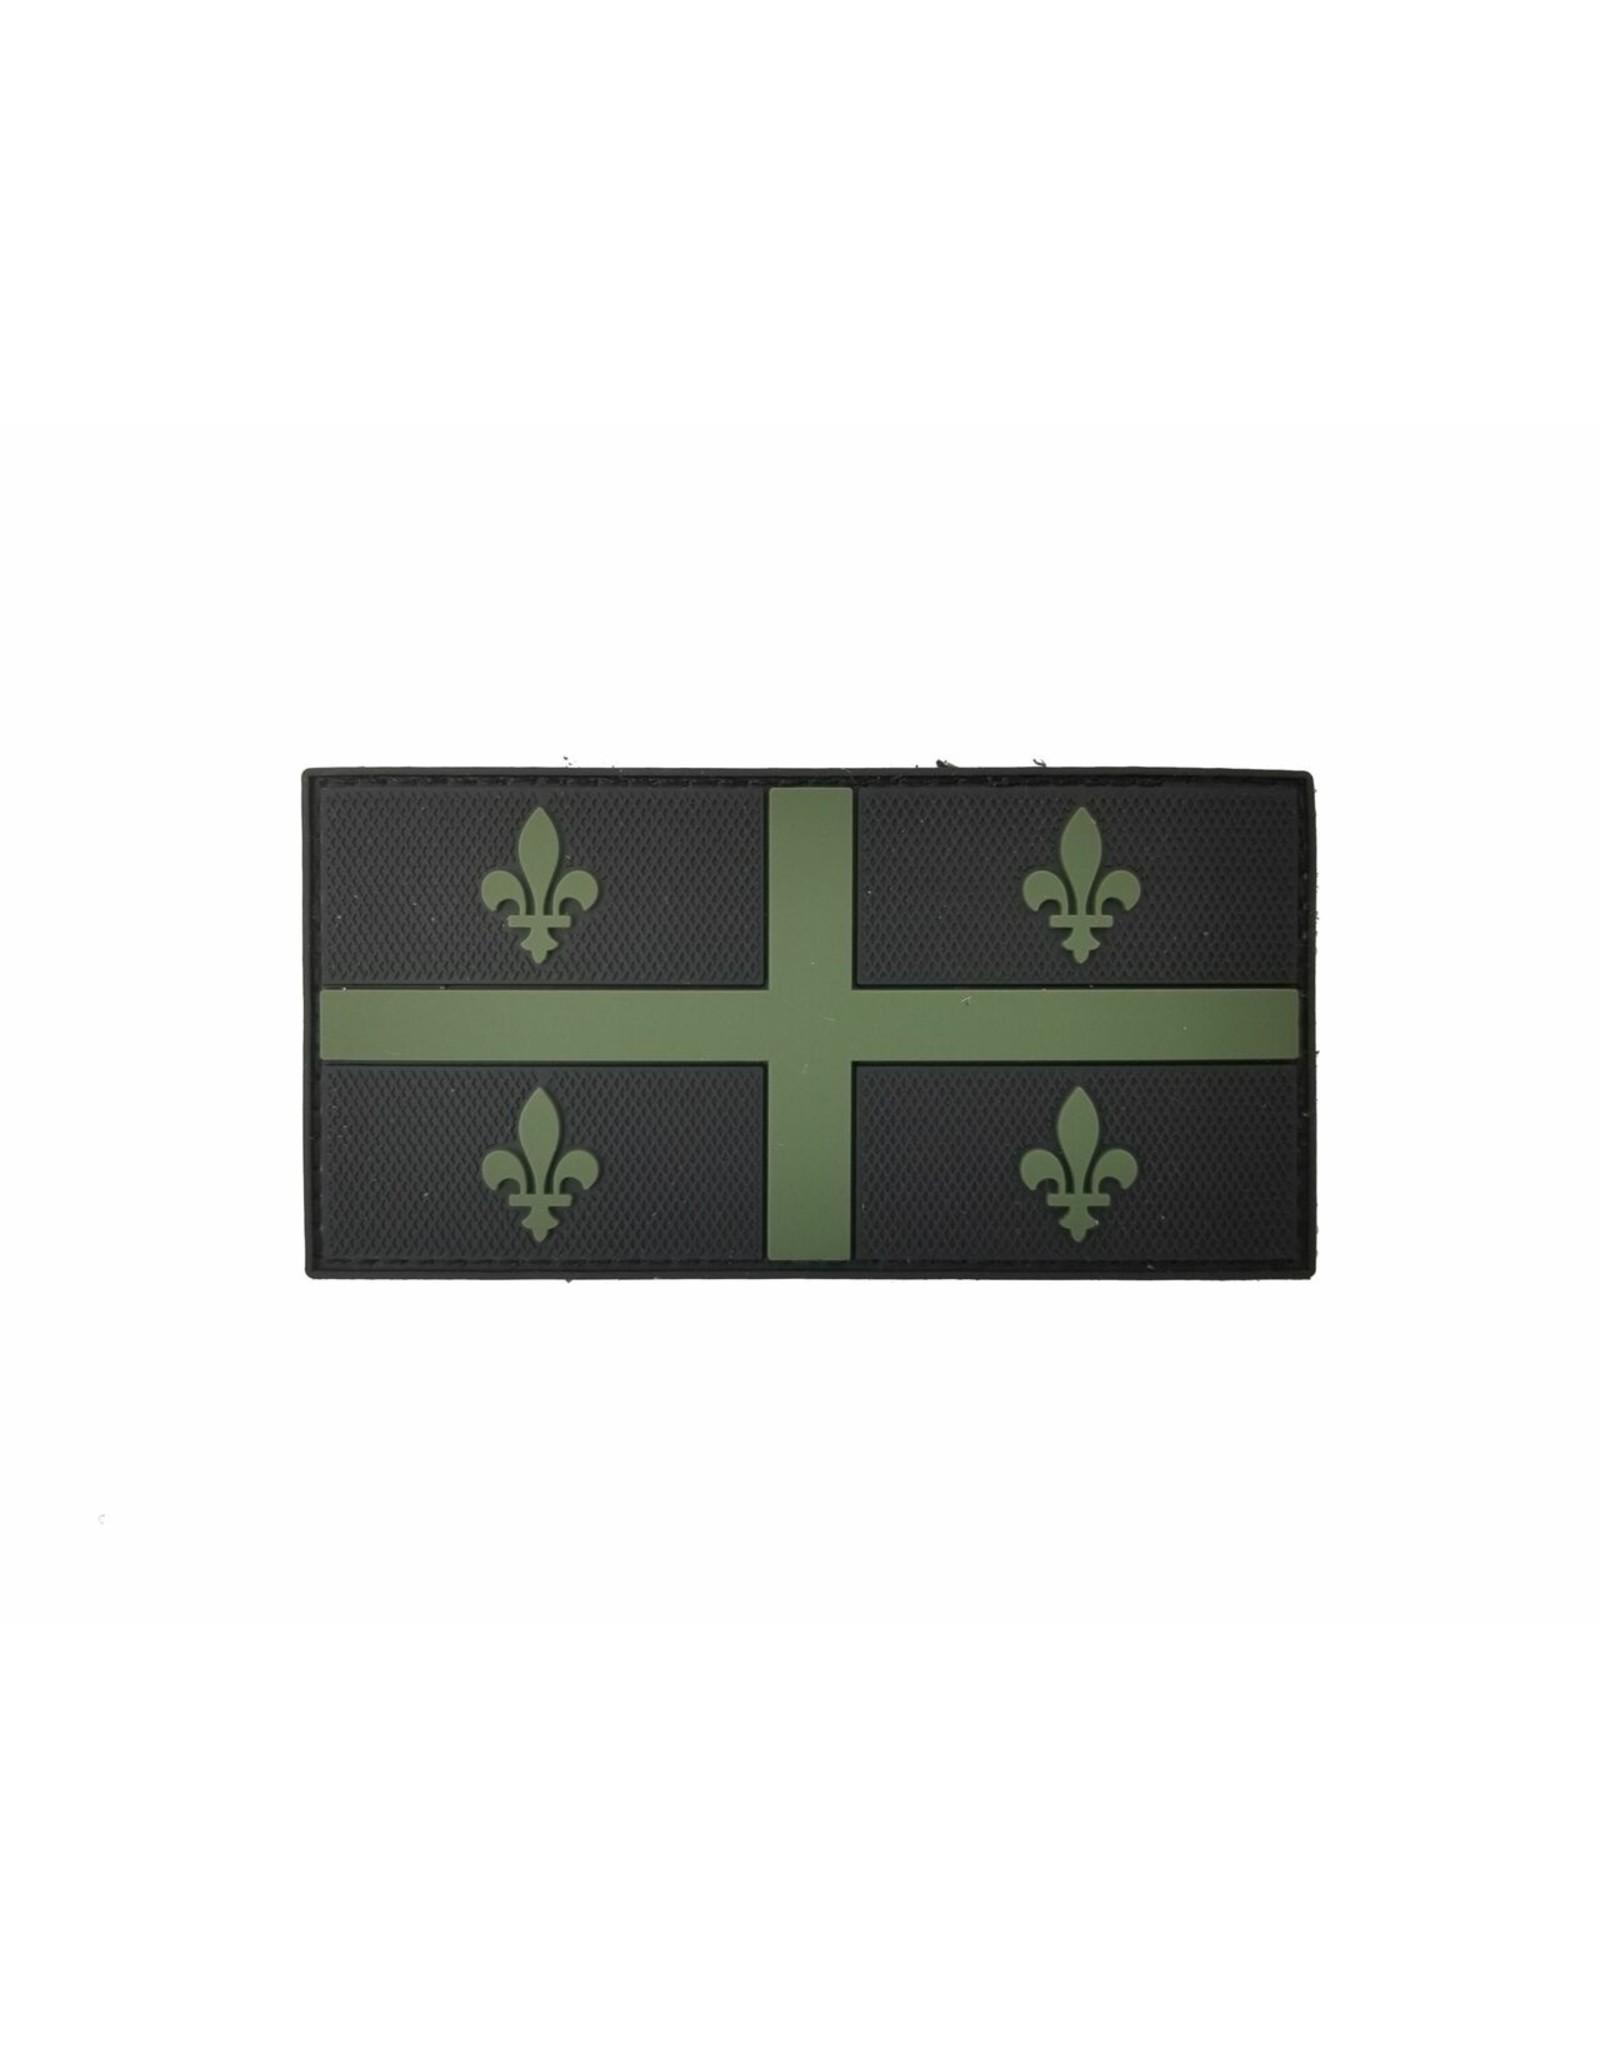 TIC Patch - QUEBEC FLAG 2X4 ODG